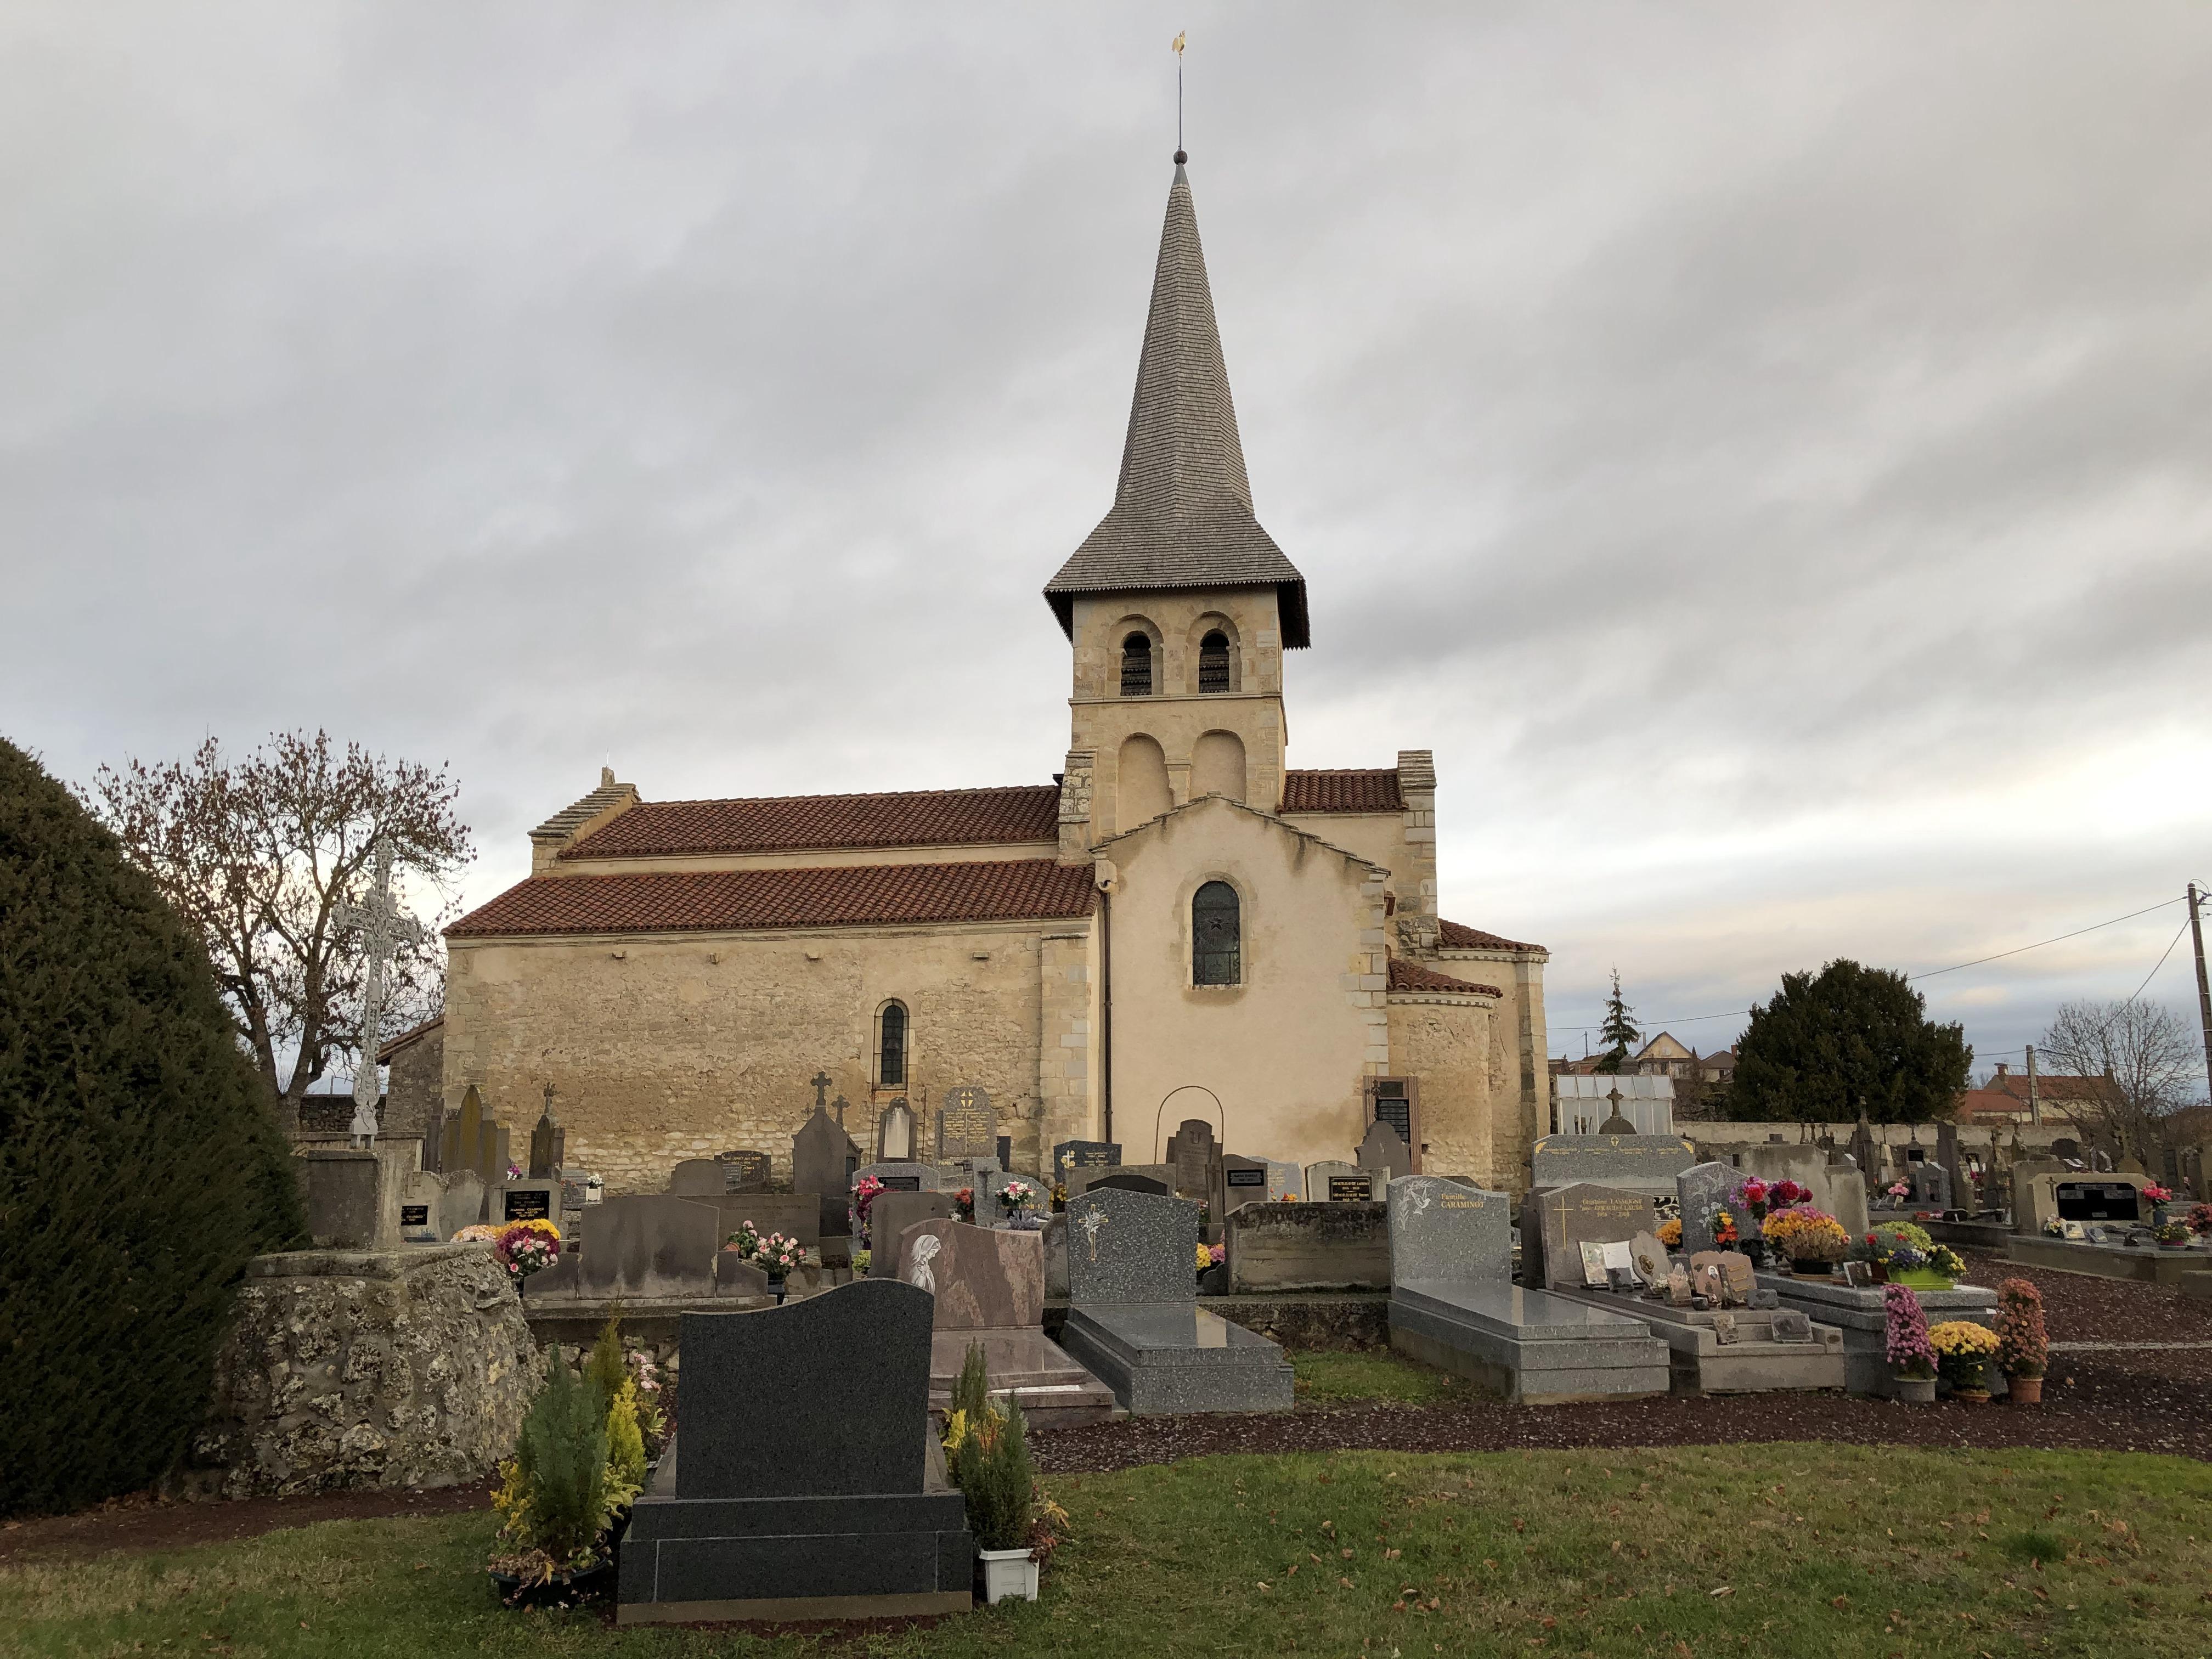 Mazerier_Eglise_Saint_Saturnin_2018